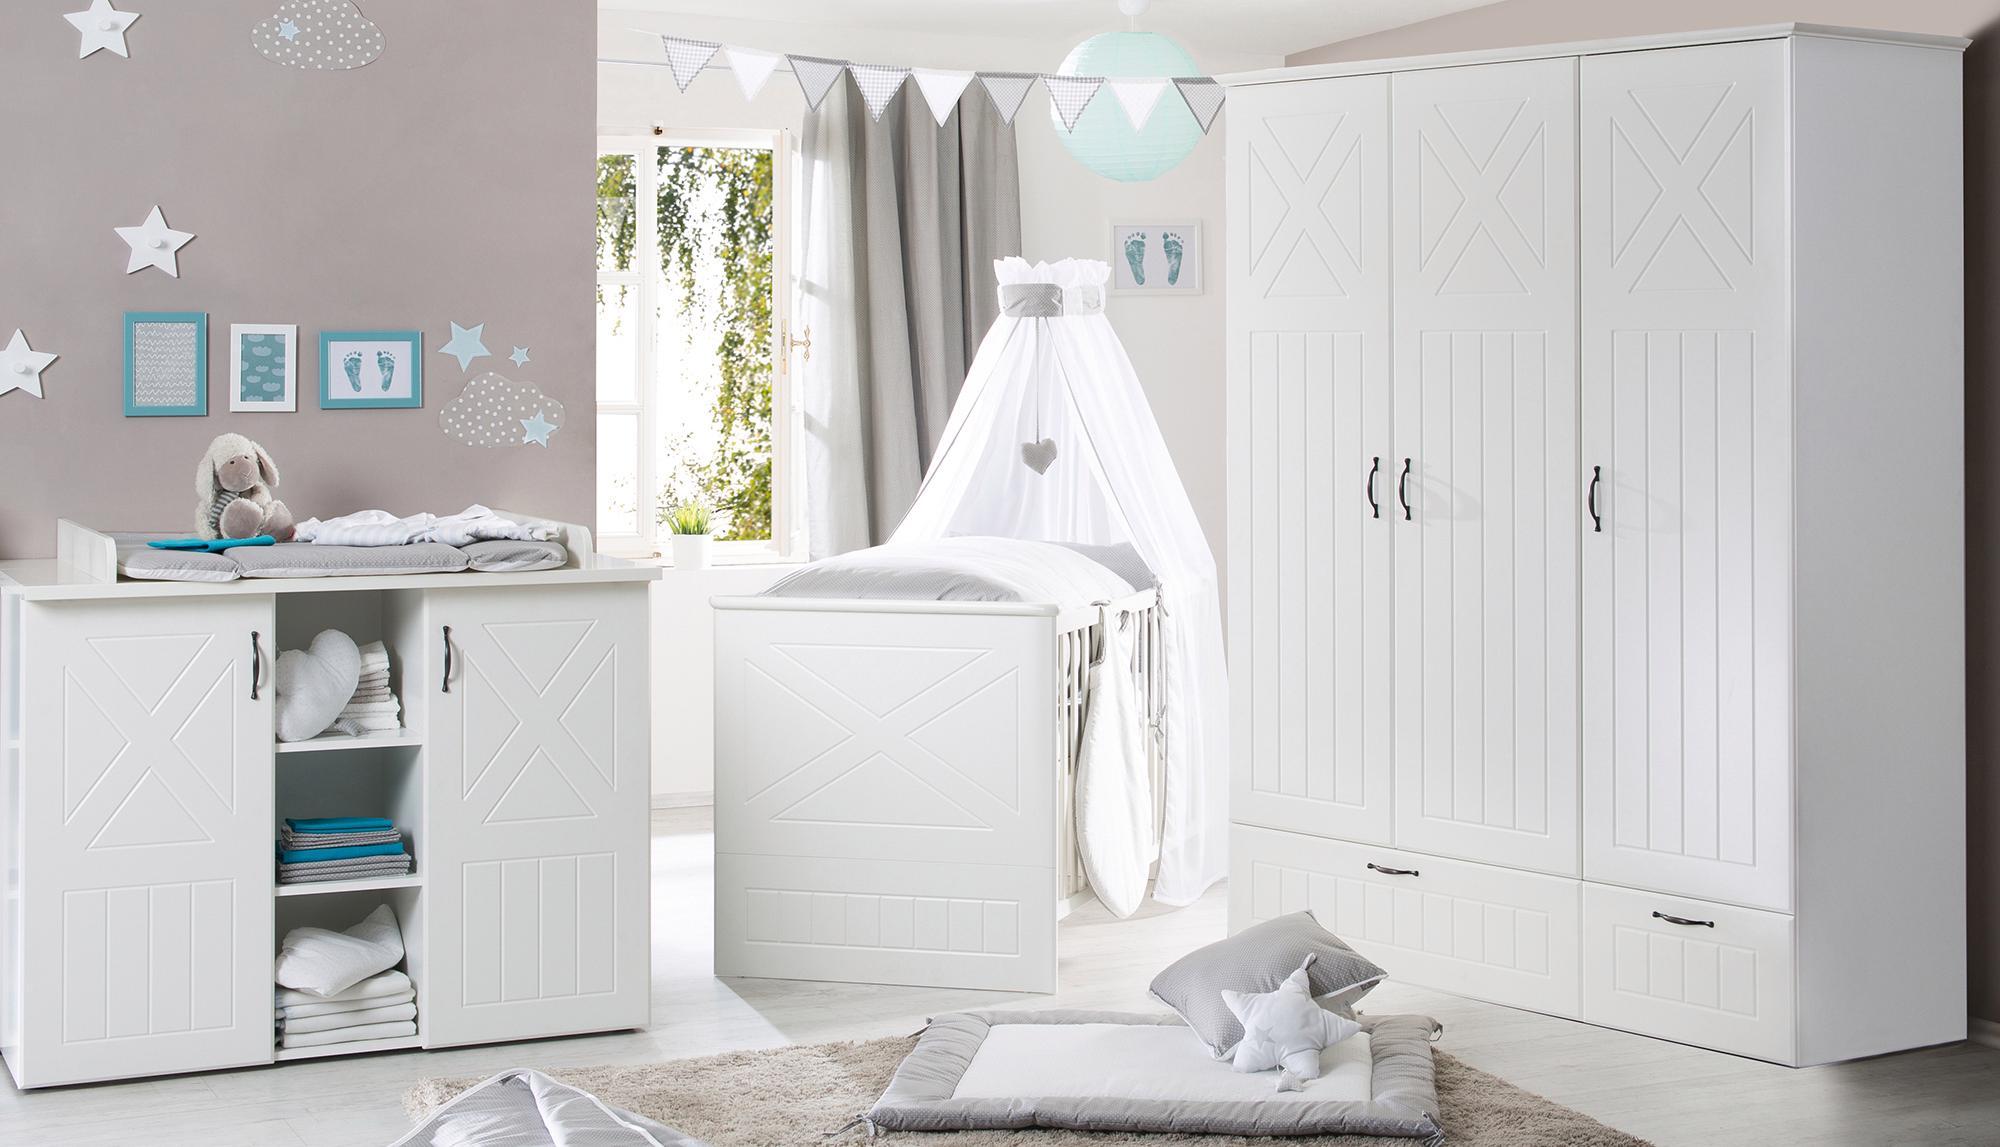 Roba Babyzimmer Set (3-tlg.), Kinderzimmer, »Constantin« | Kinderzimmer > Babymöbel > Komplett-Babyzimmer | Weiß | Abs - Metall - Spanplatte | ROBA